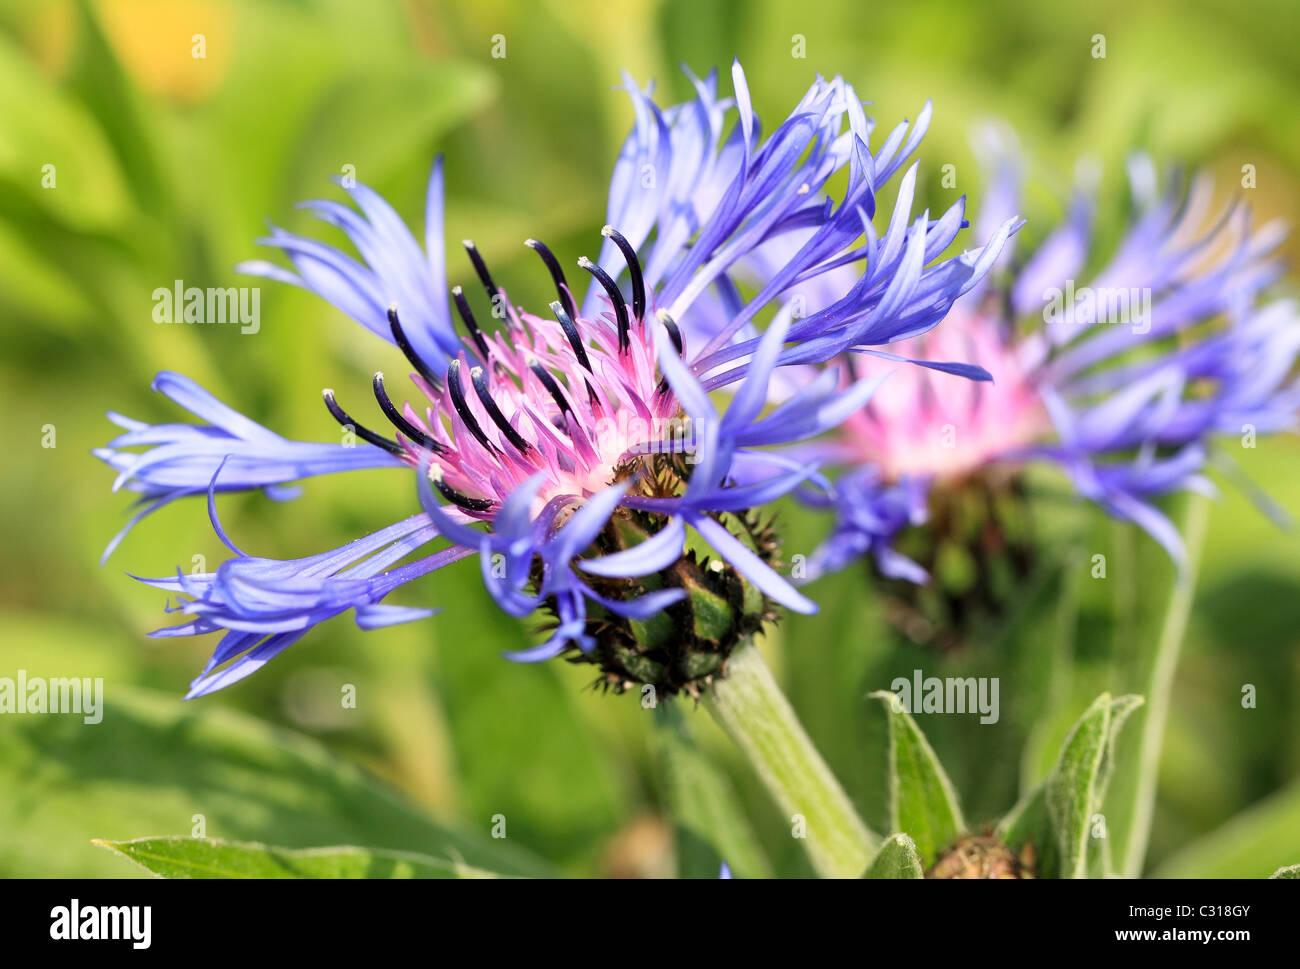 Fiordaliso, Laurea pulsante, Bluebottle, Boutonniere flower, Hurtsickle, fiore Cyani Centaurea cyanus Immagini Stock